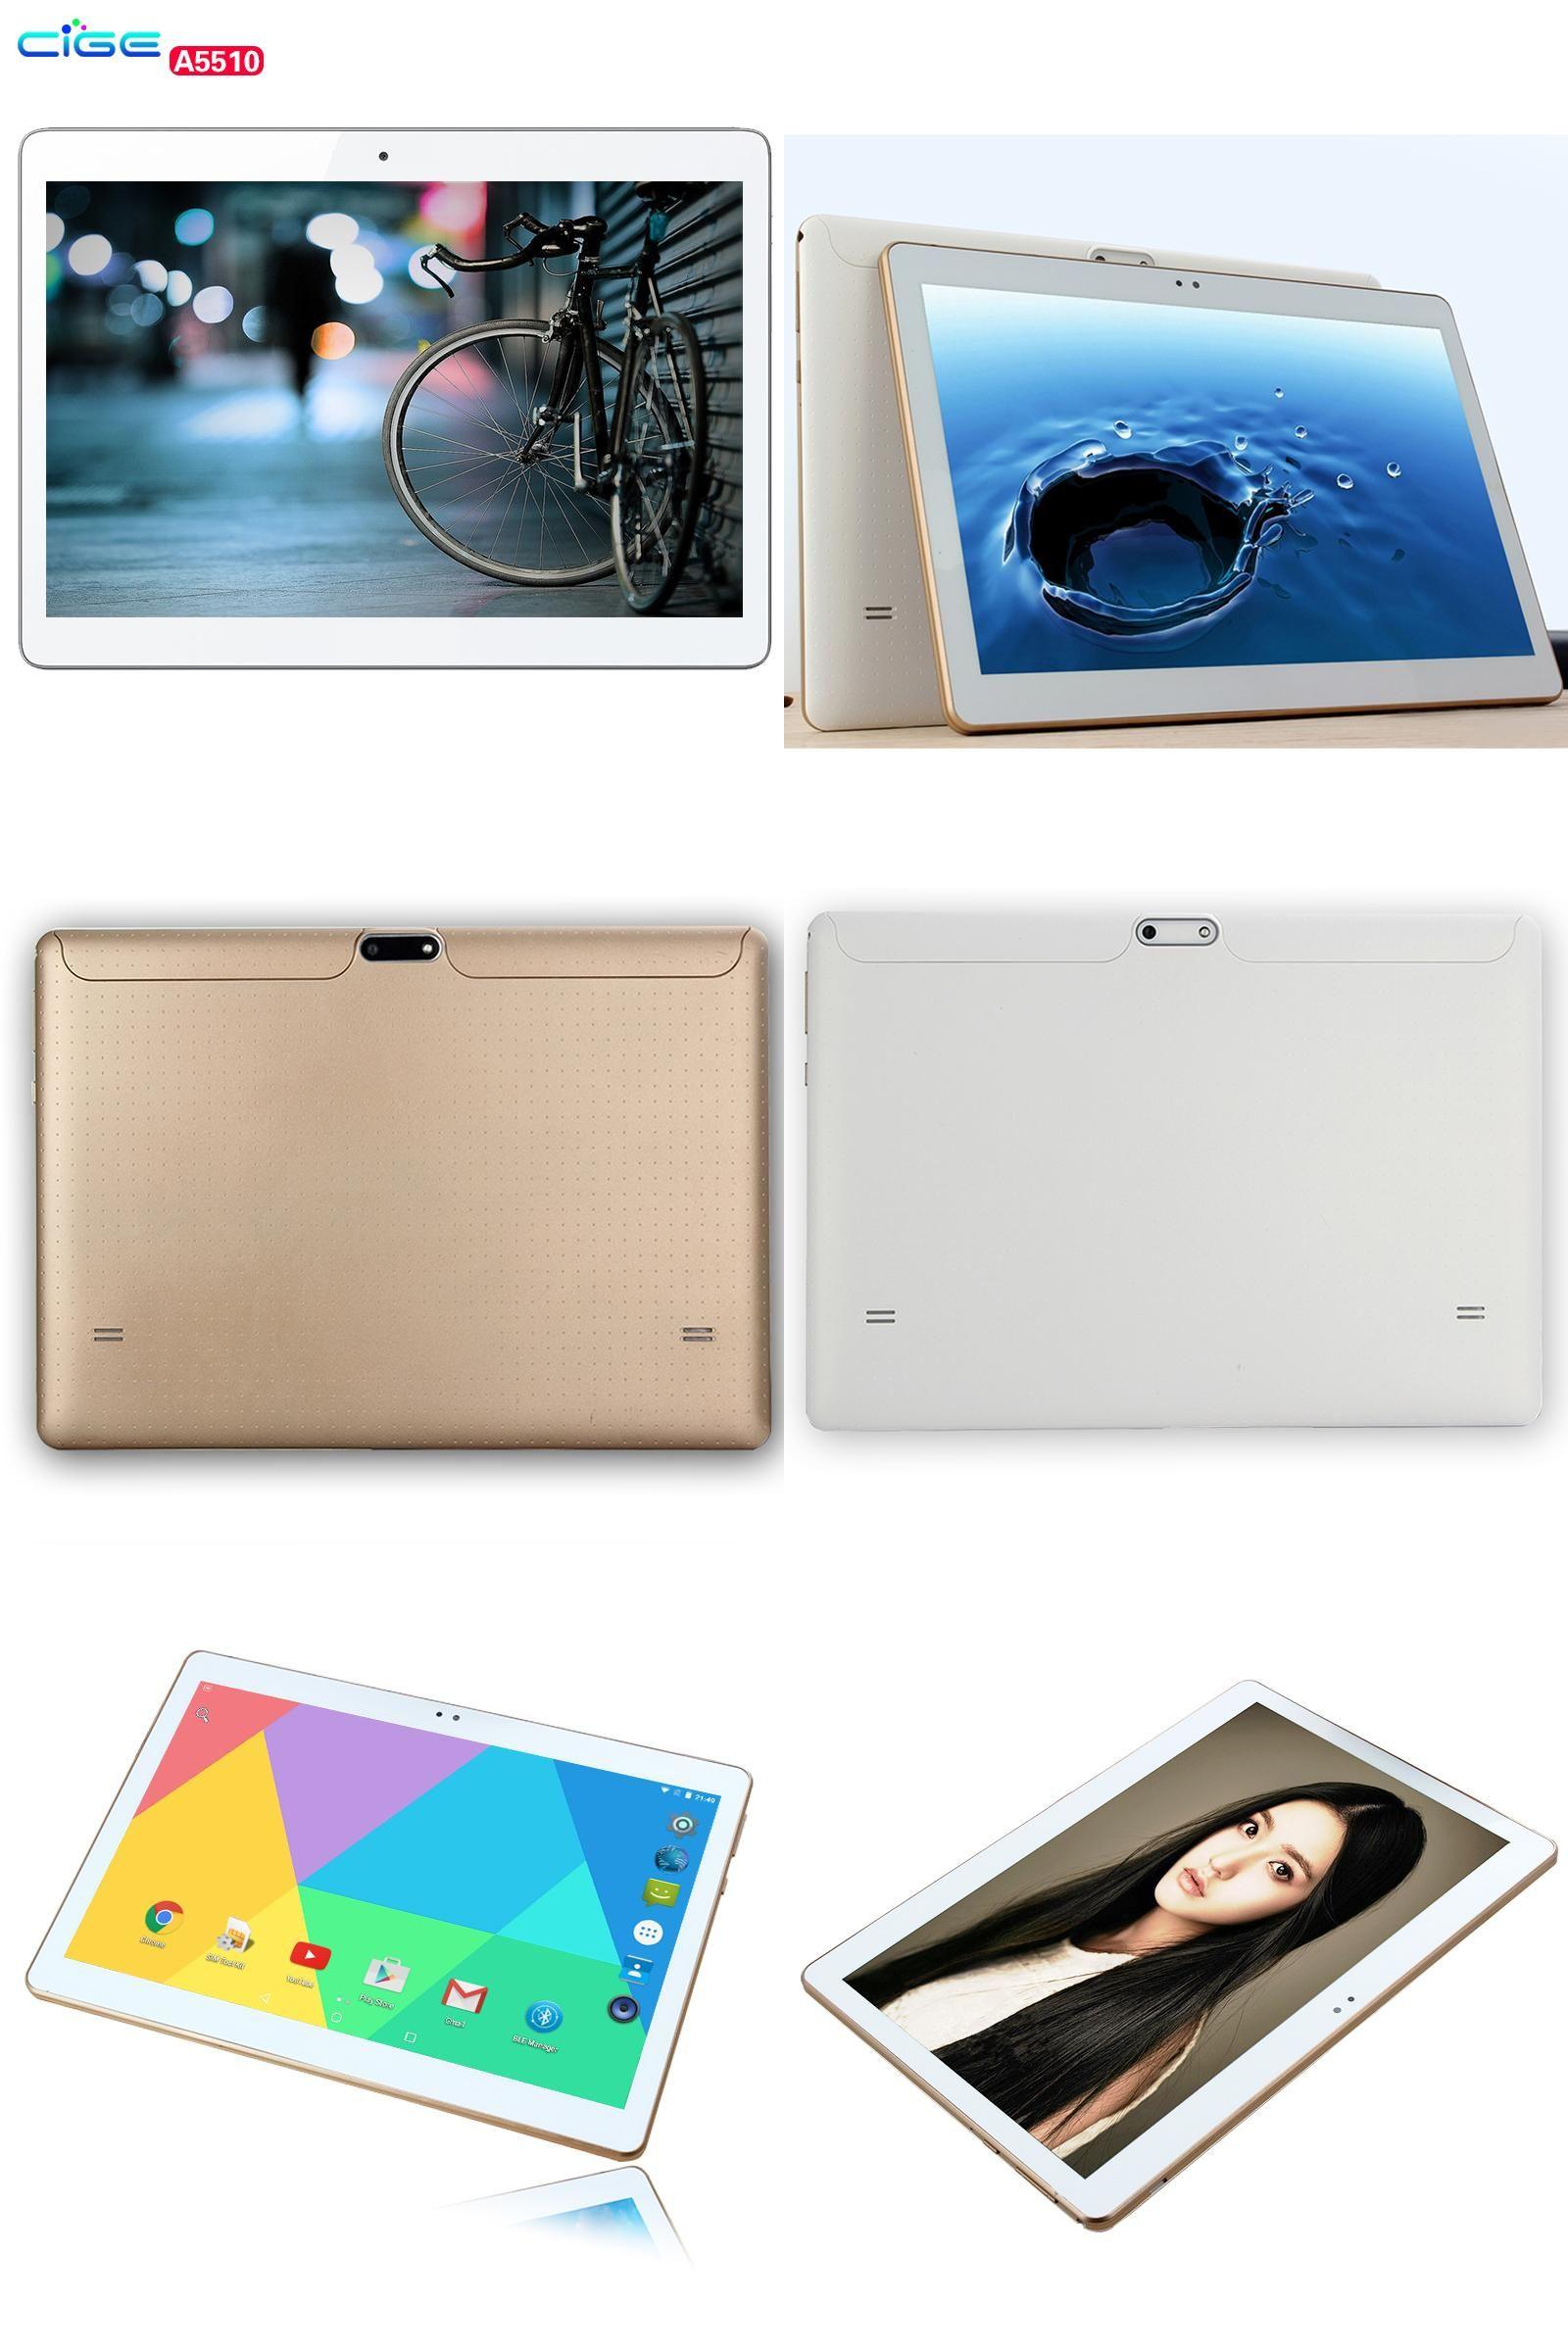 Visit to Buy] New 4G LTE CIGE A55510 10 1 inch Ram 4GB Rom